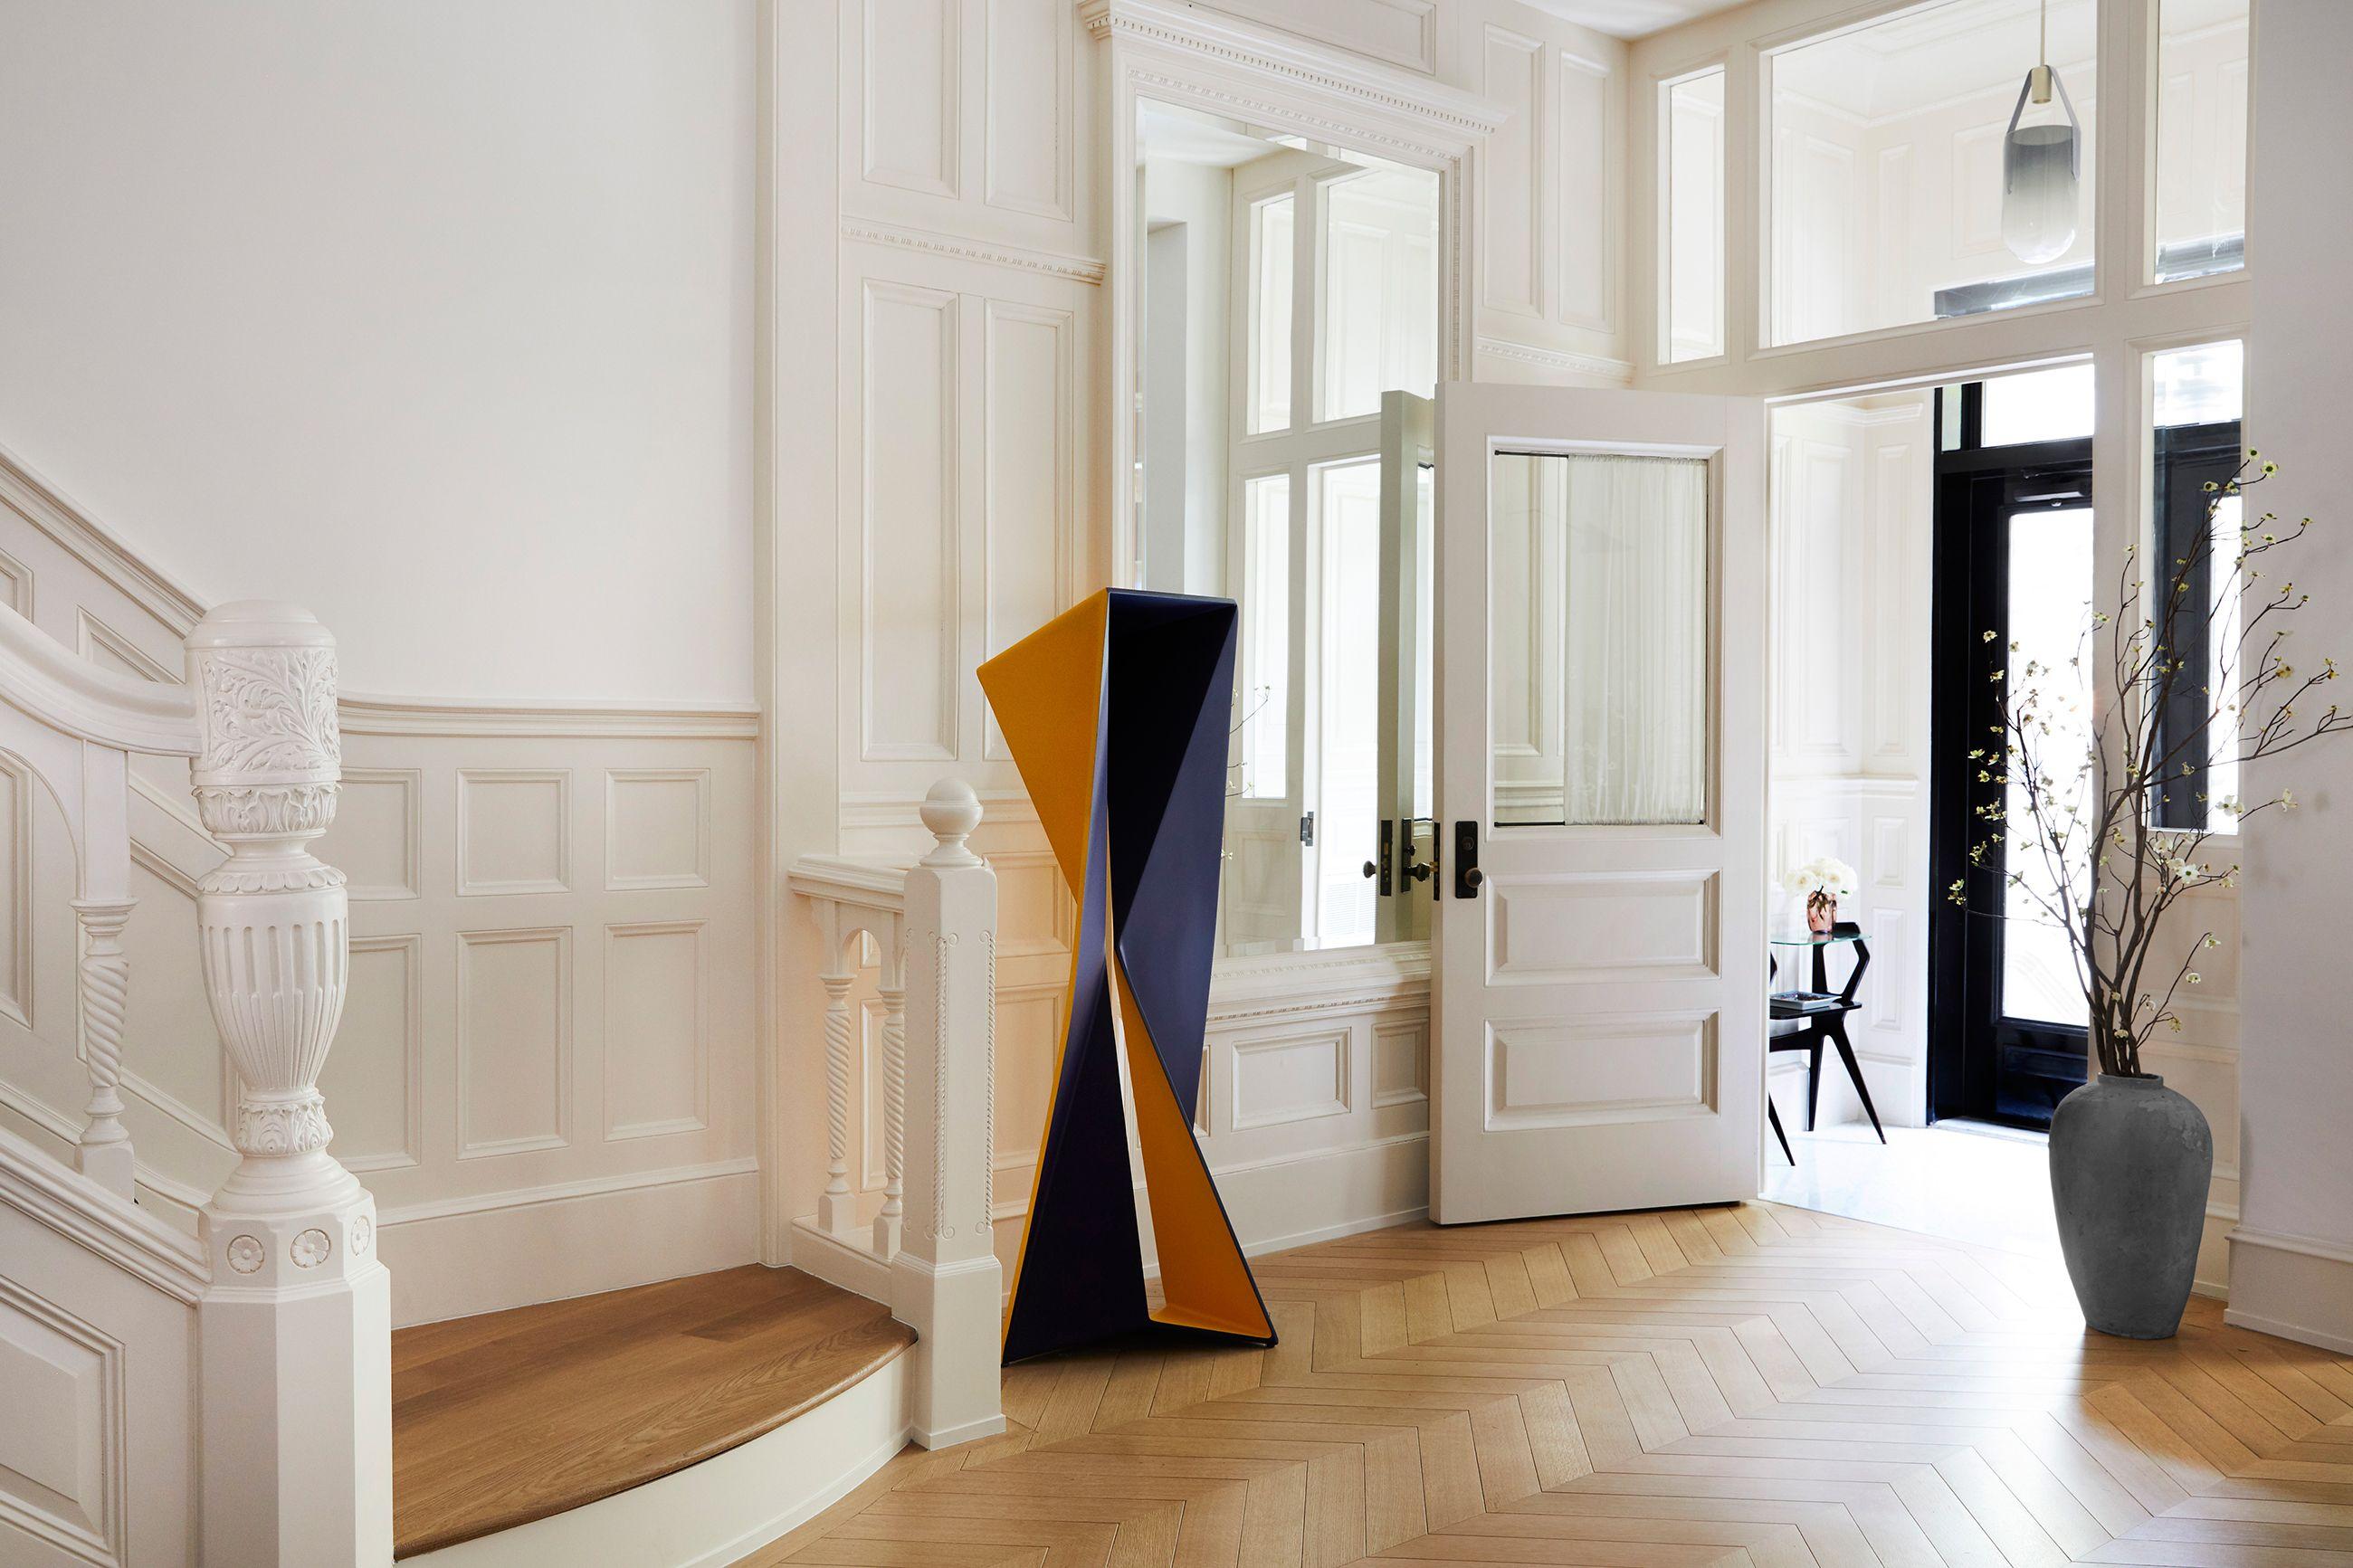 See How Gachot Studios Designed an Artful New York Townhouse